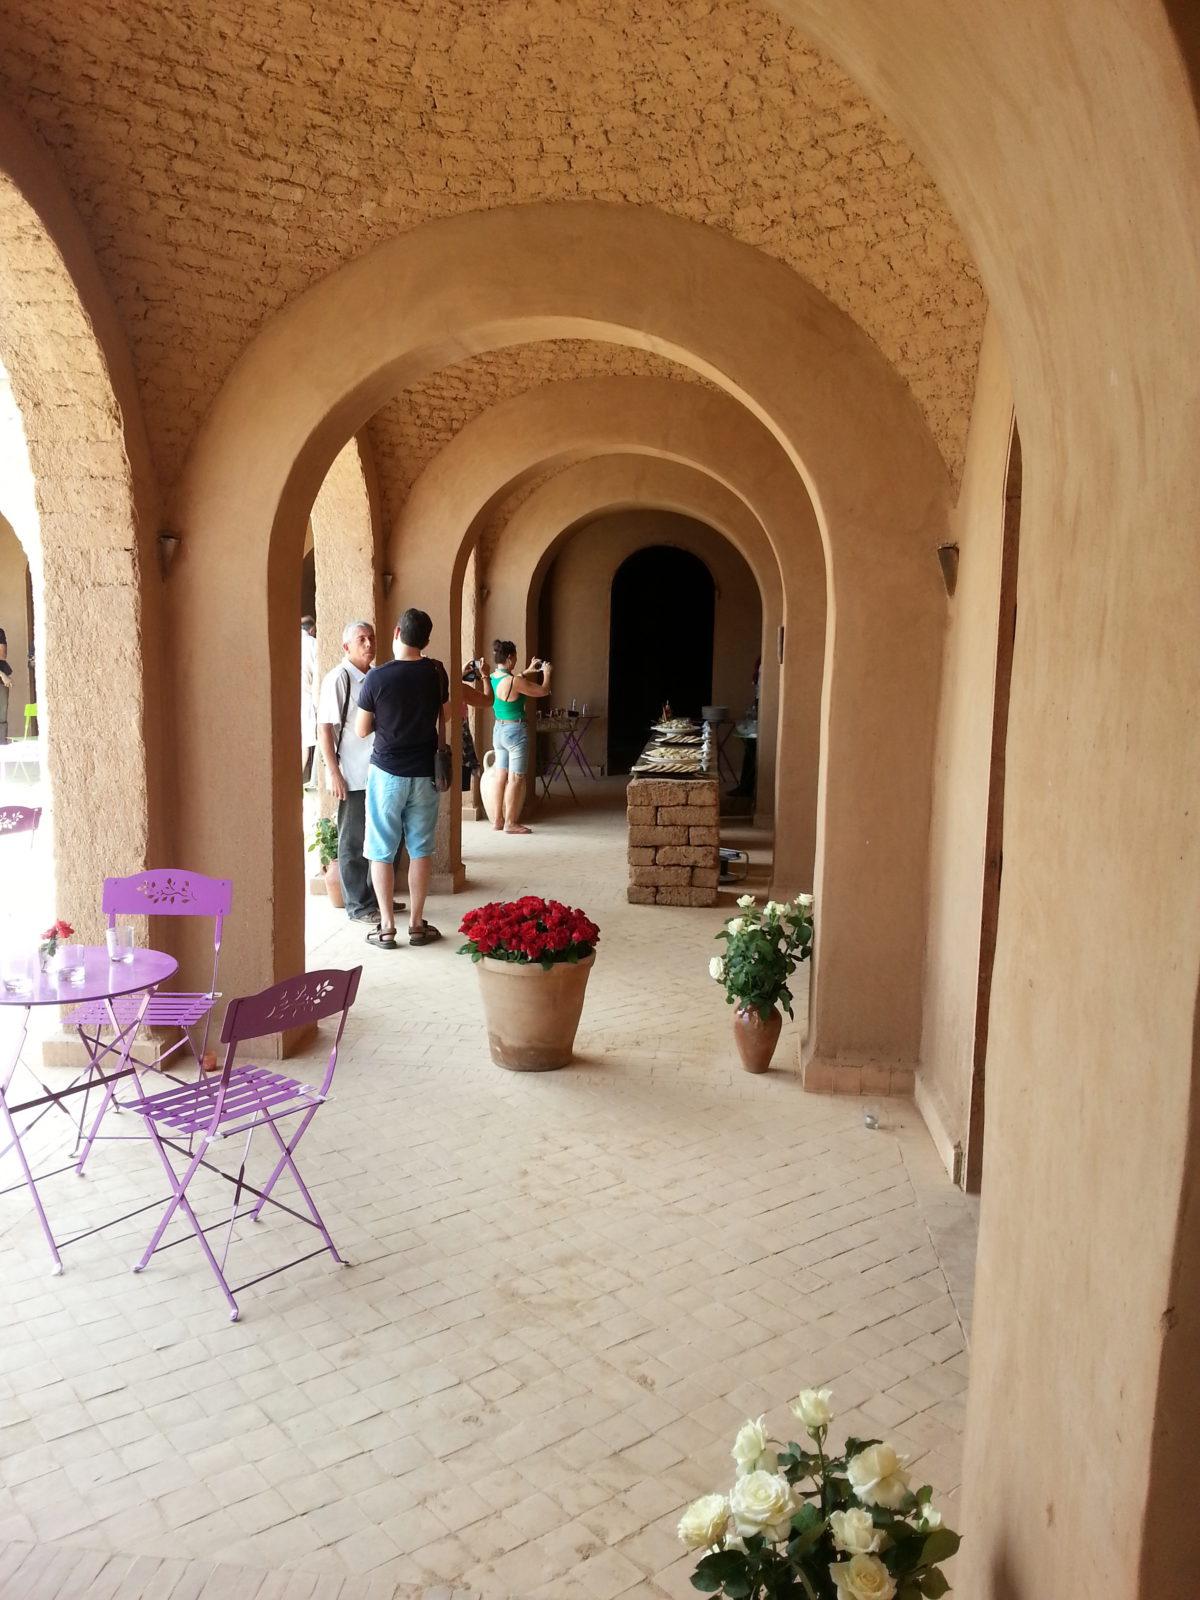 Leemstenen Gebouw in Marrakech